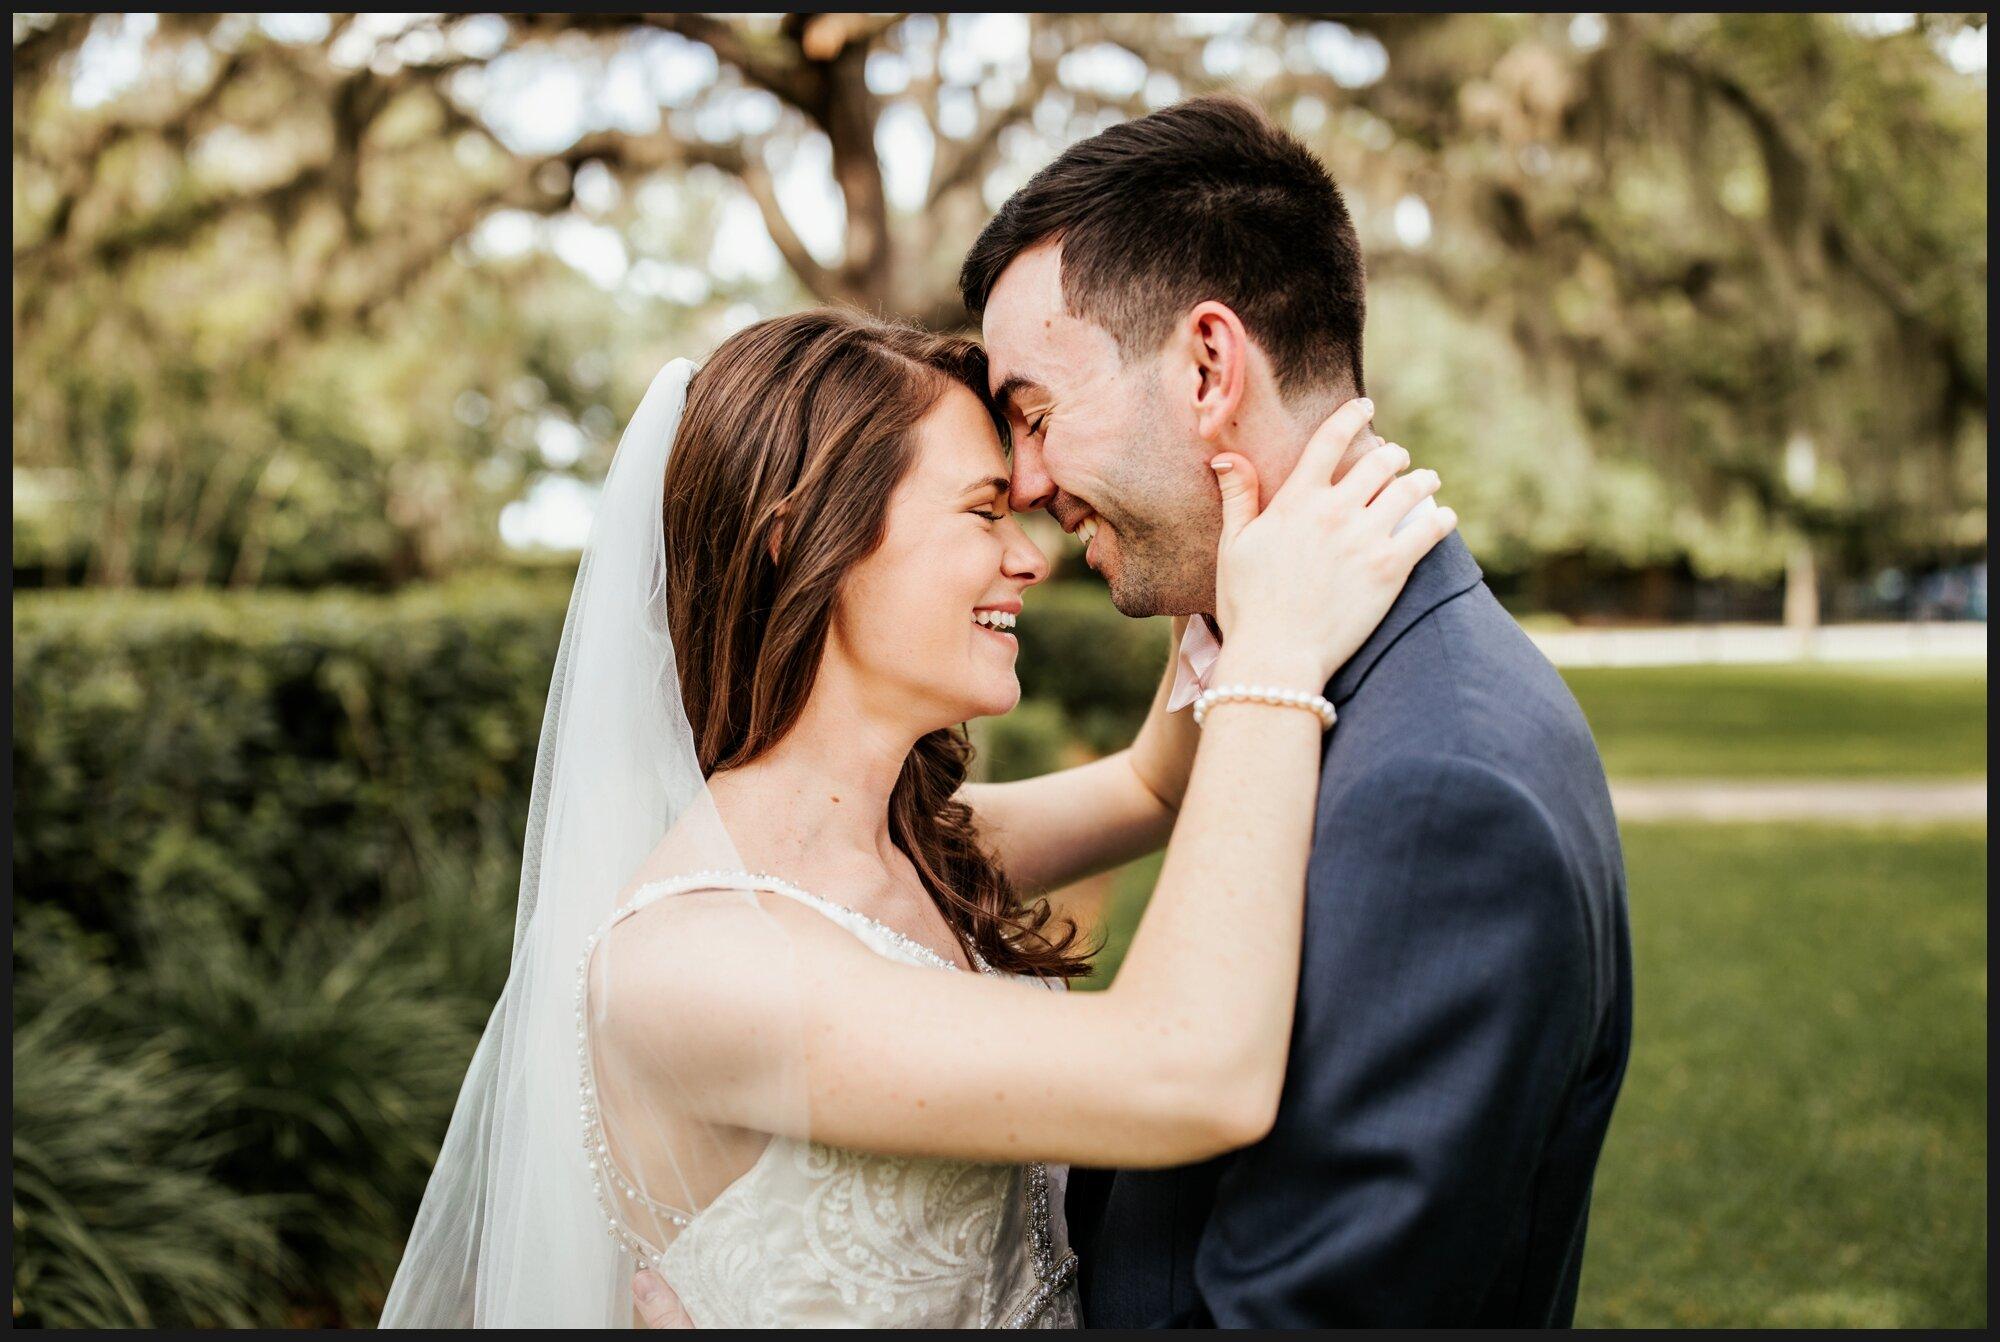 Orlando-Wedding-Photographer-destination-wedding-photographer-florida-wedding-photographer-hawaii-wedding-photographer_0667.jpg